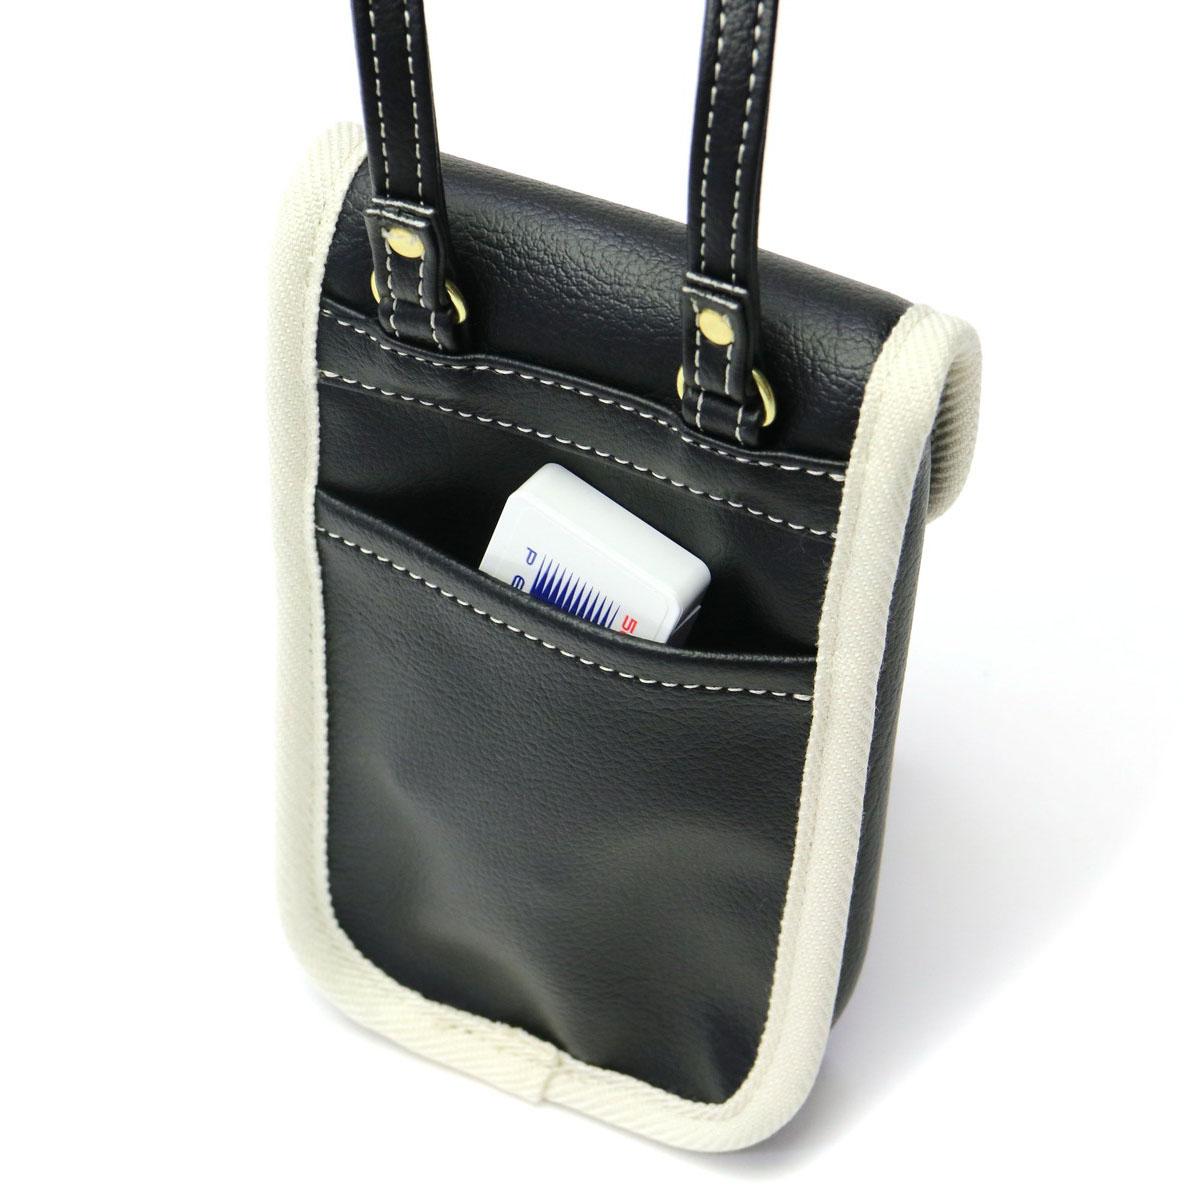 949dced25df7 ESSENTIAL DESIGNS × PORTER shoulder bag SHOULDER POUCH Almighty series  Yoshida bag mini shoulder E181803